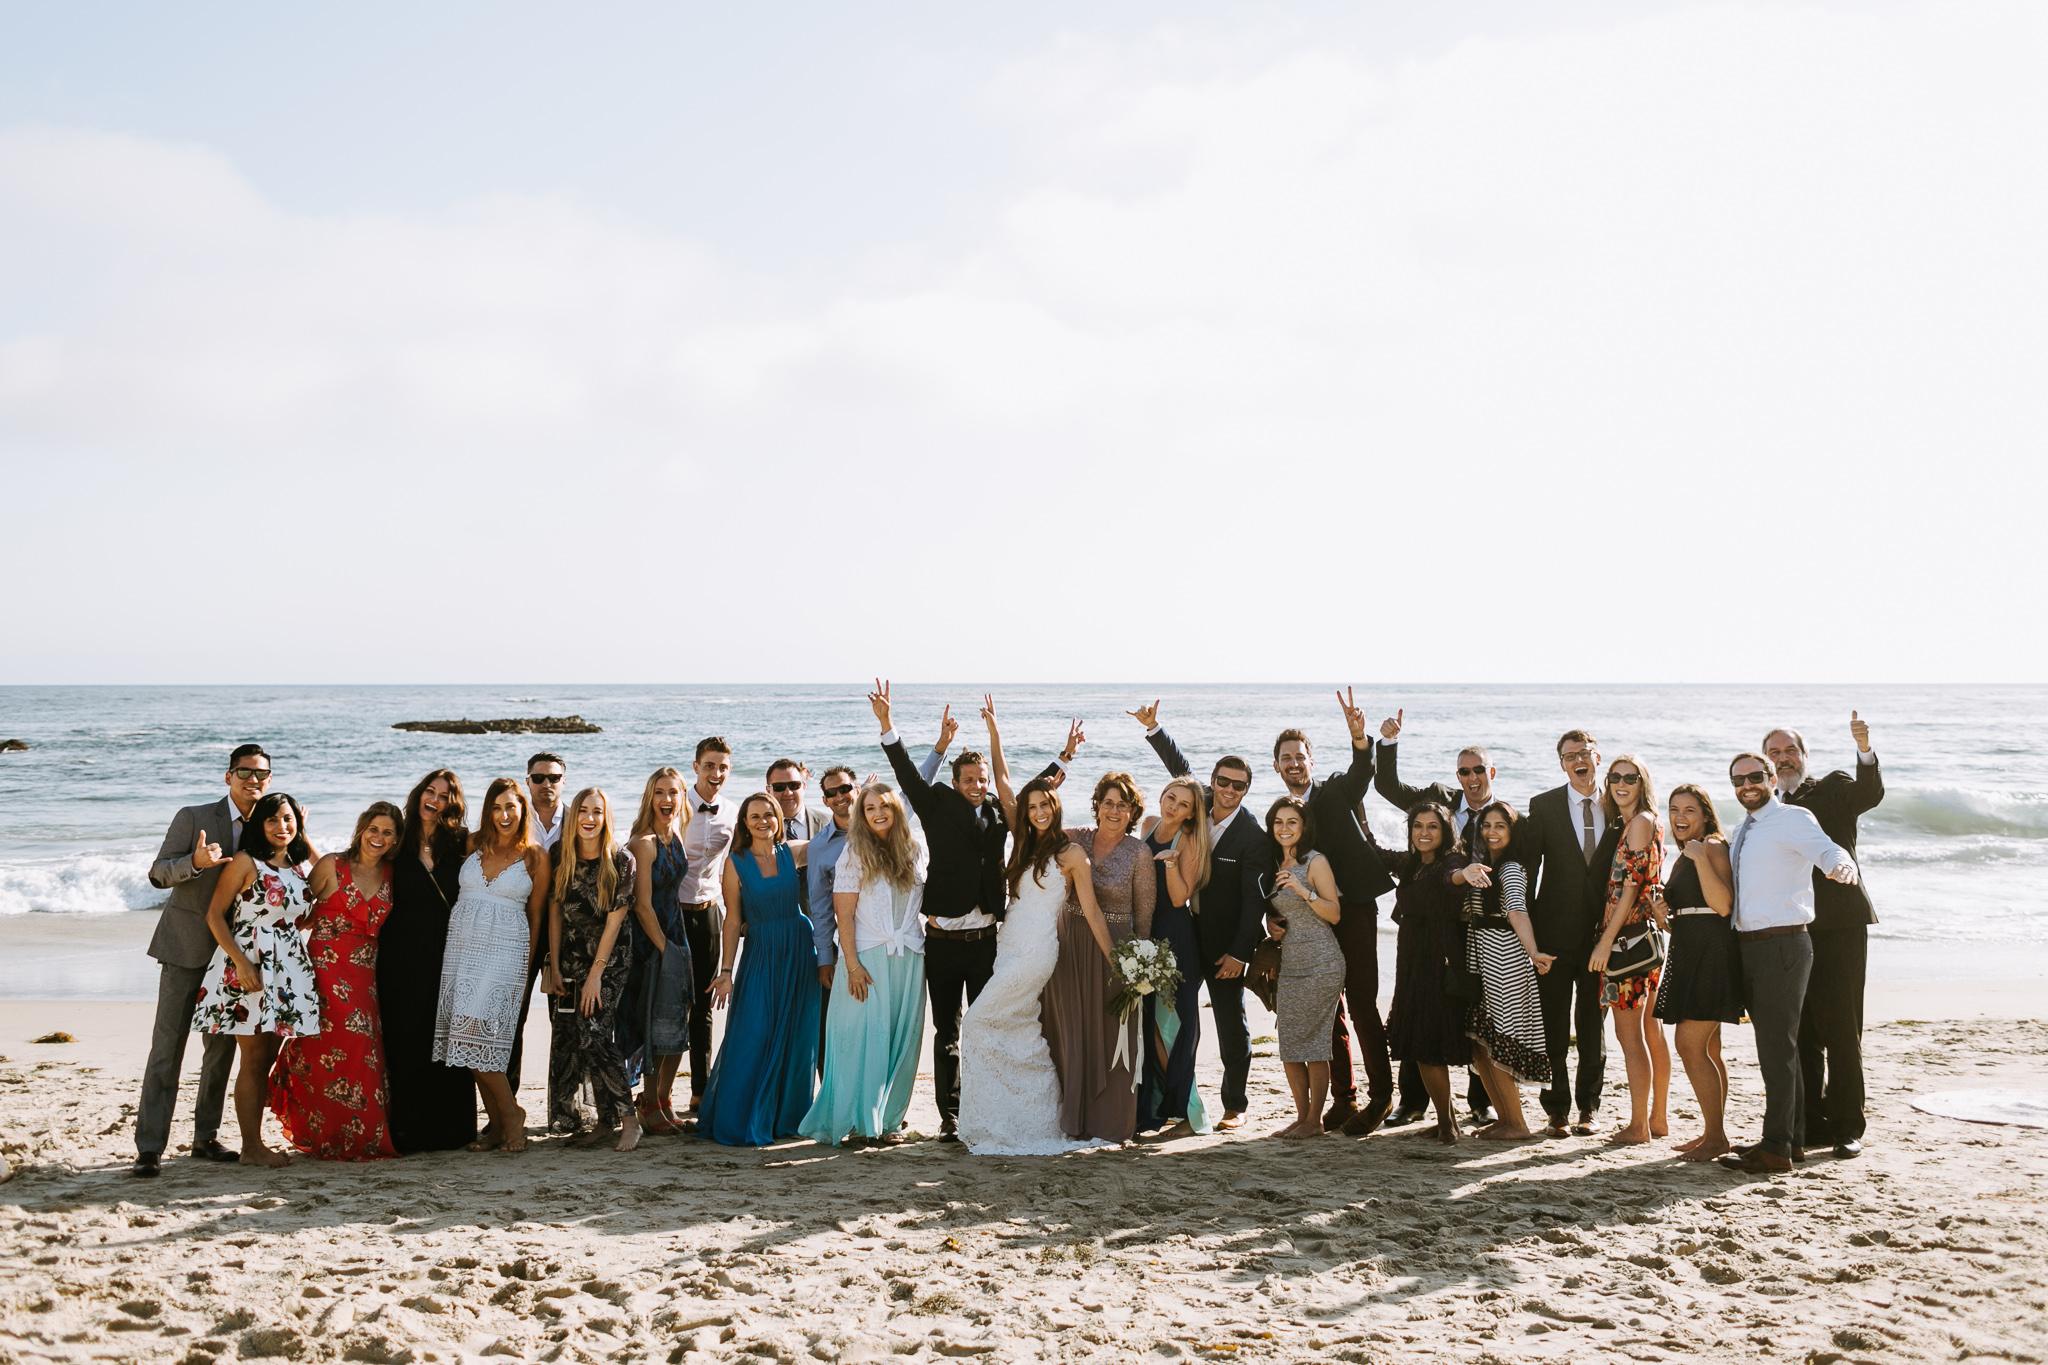 LagunaBeach-WeddingPhotographer-41.jpg